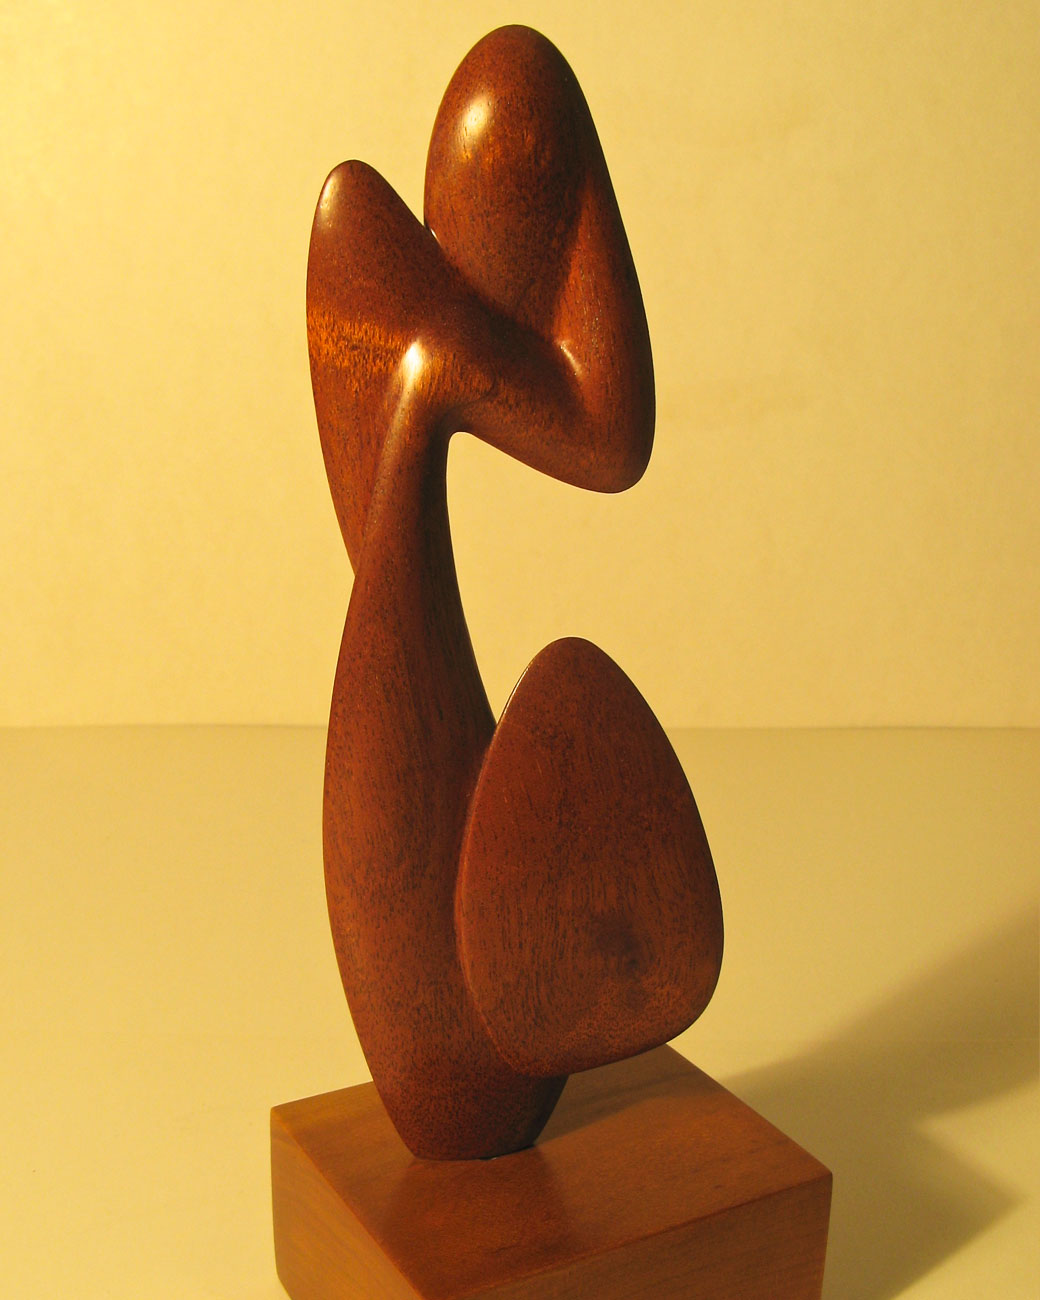 Contemplative Spirit - Wood Carving